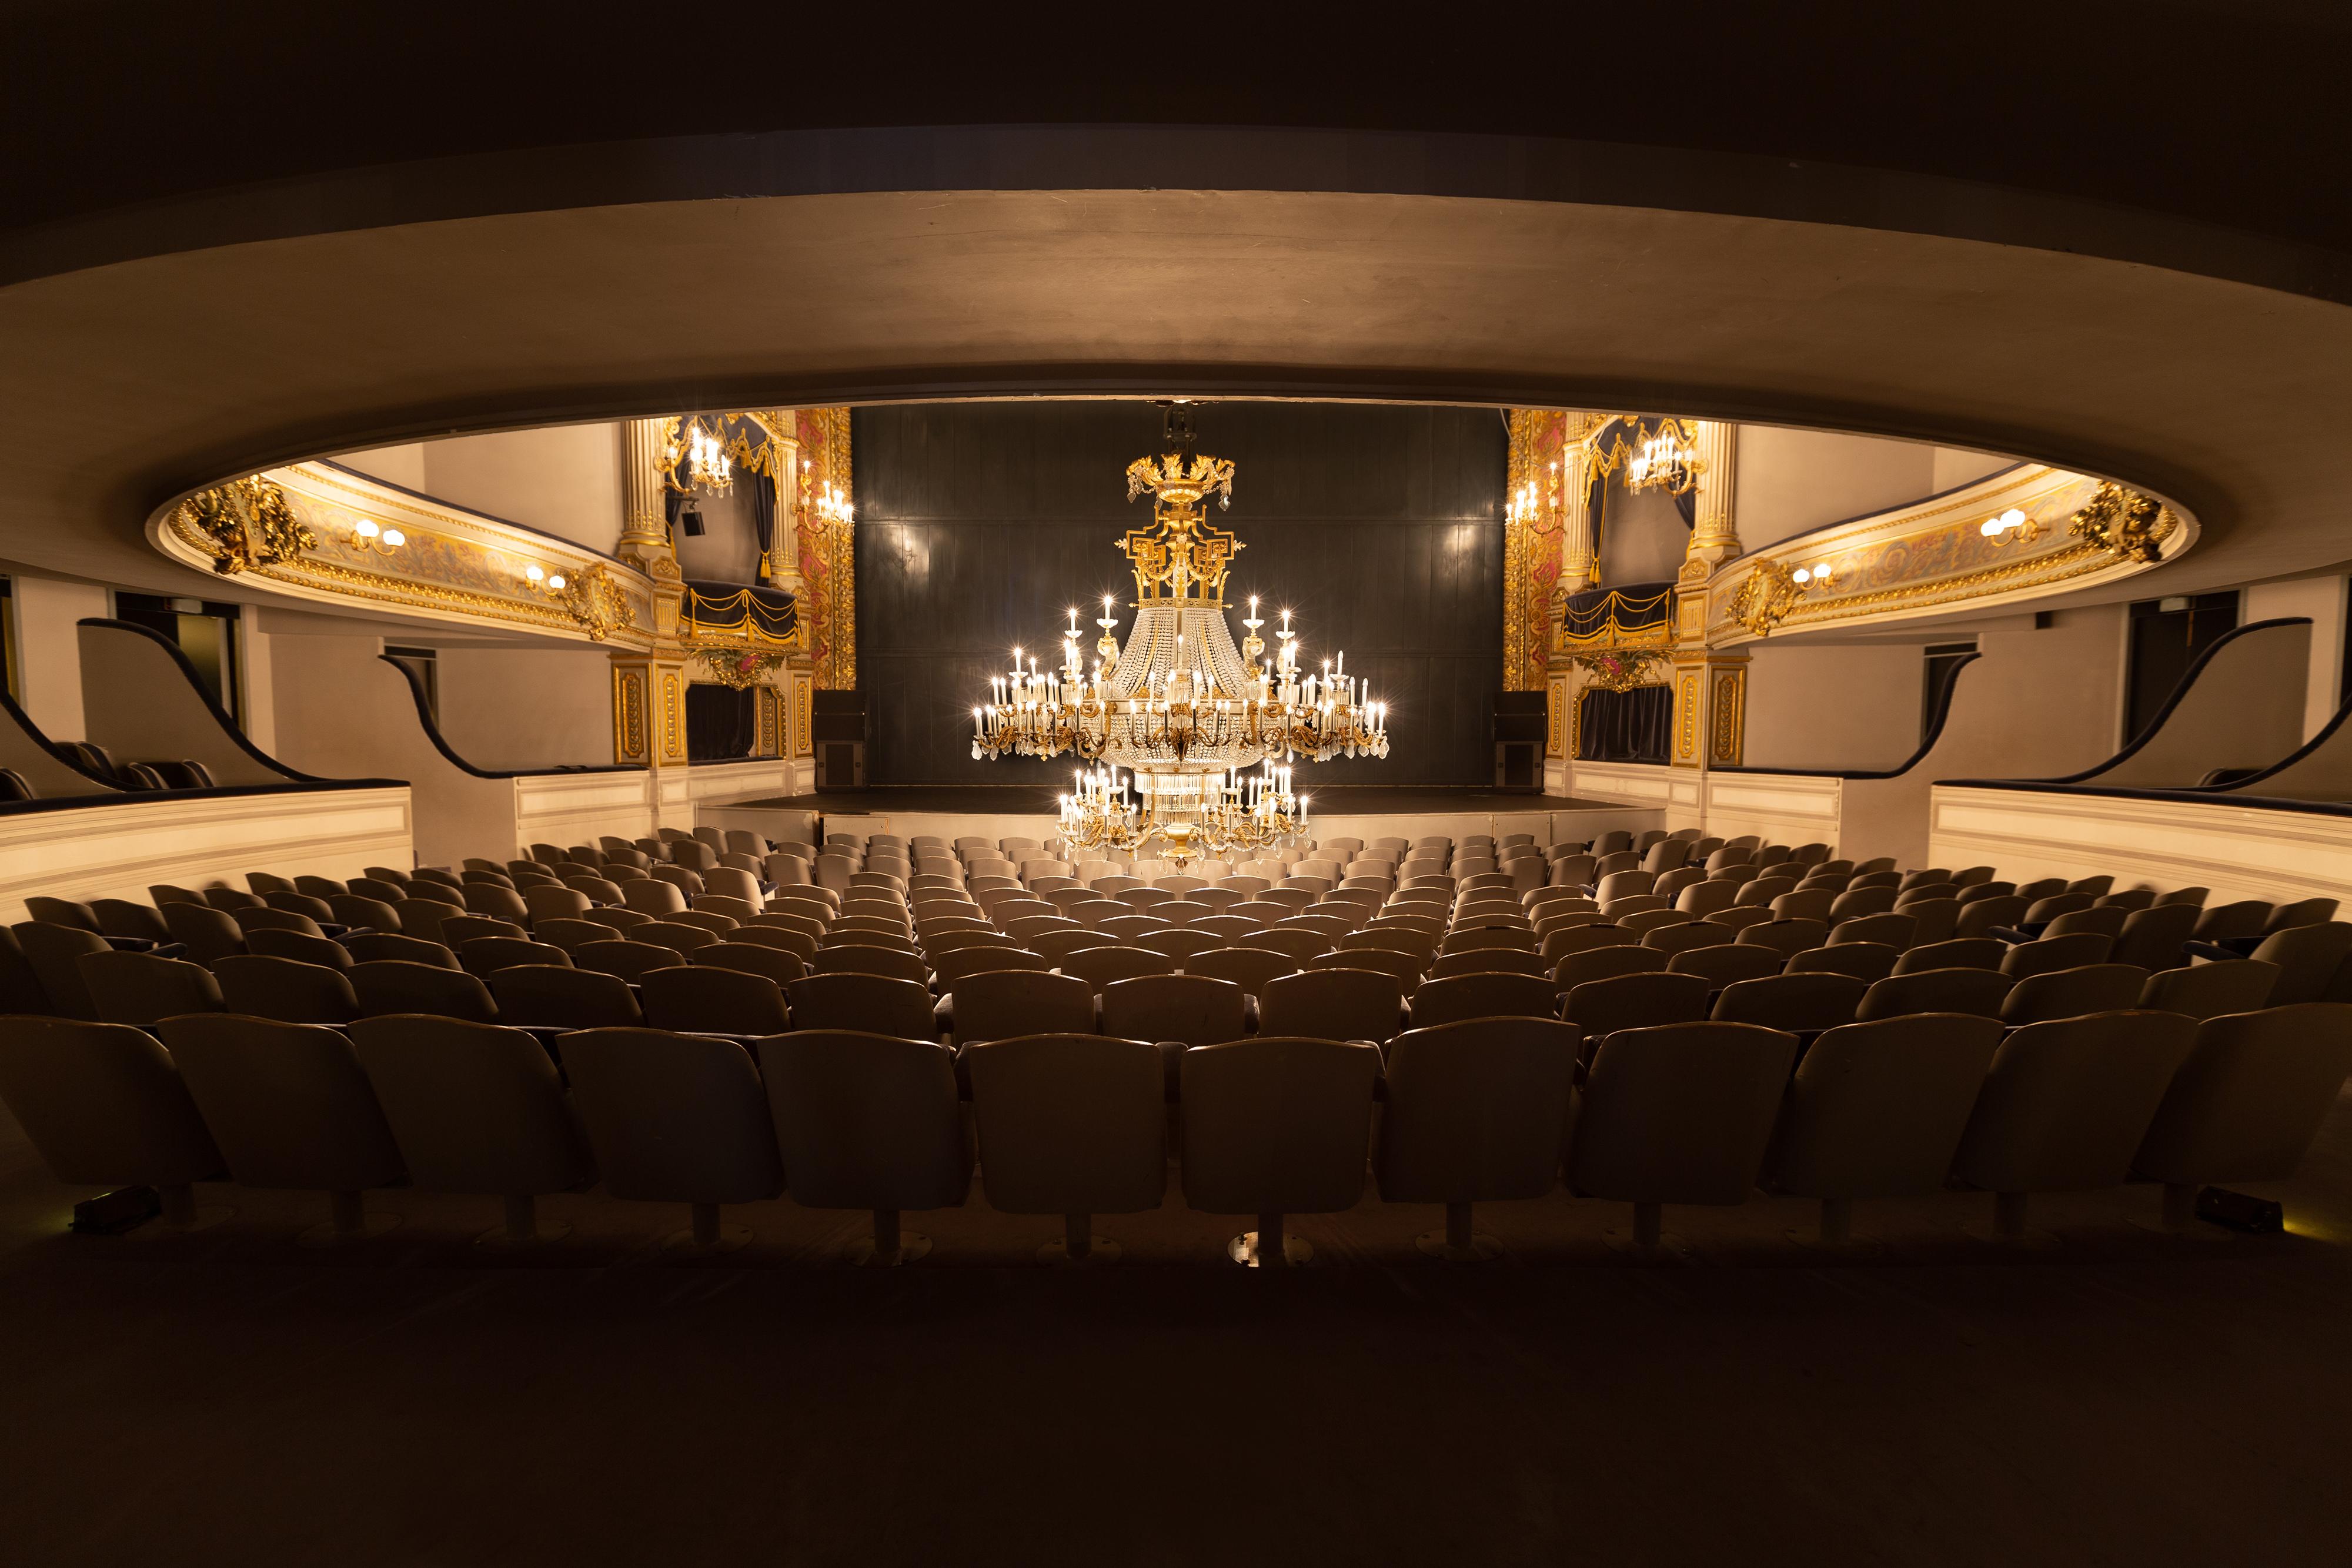 Namur's Theater